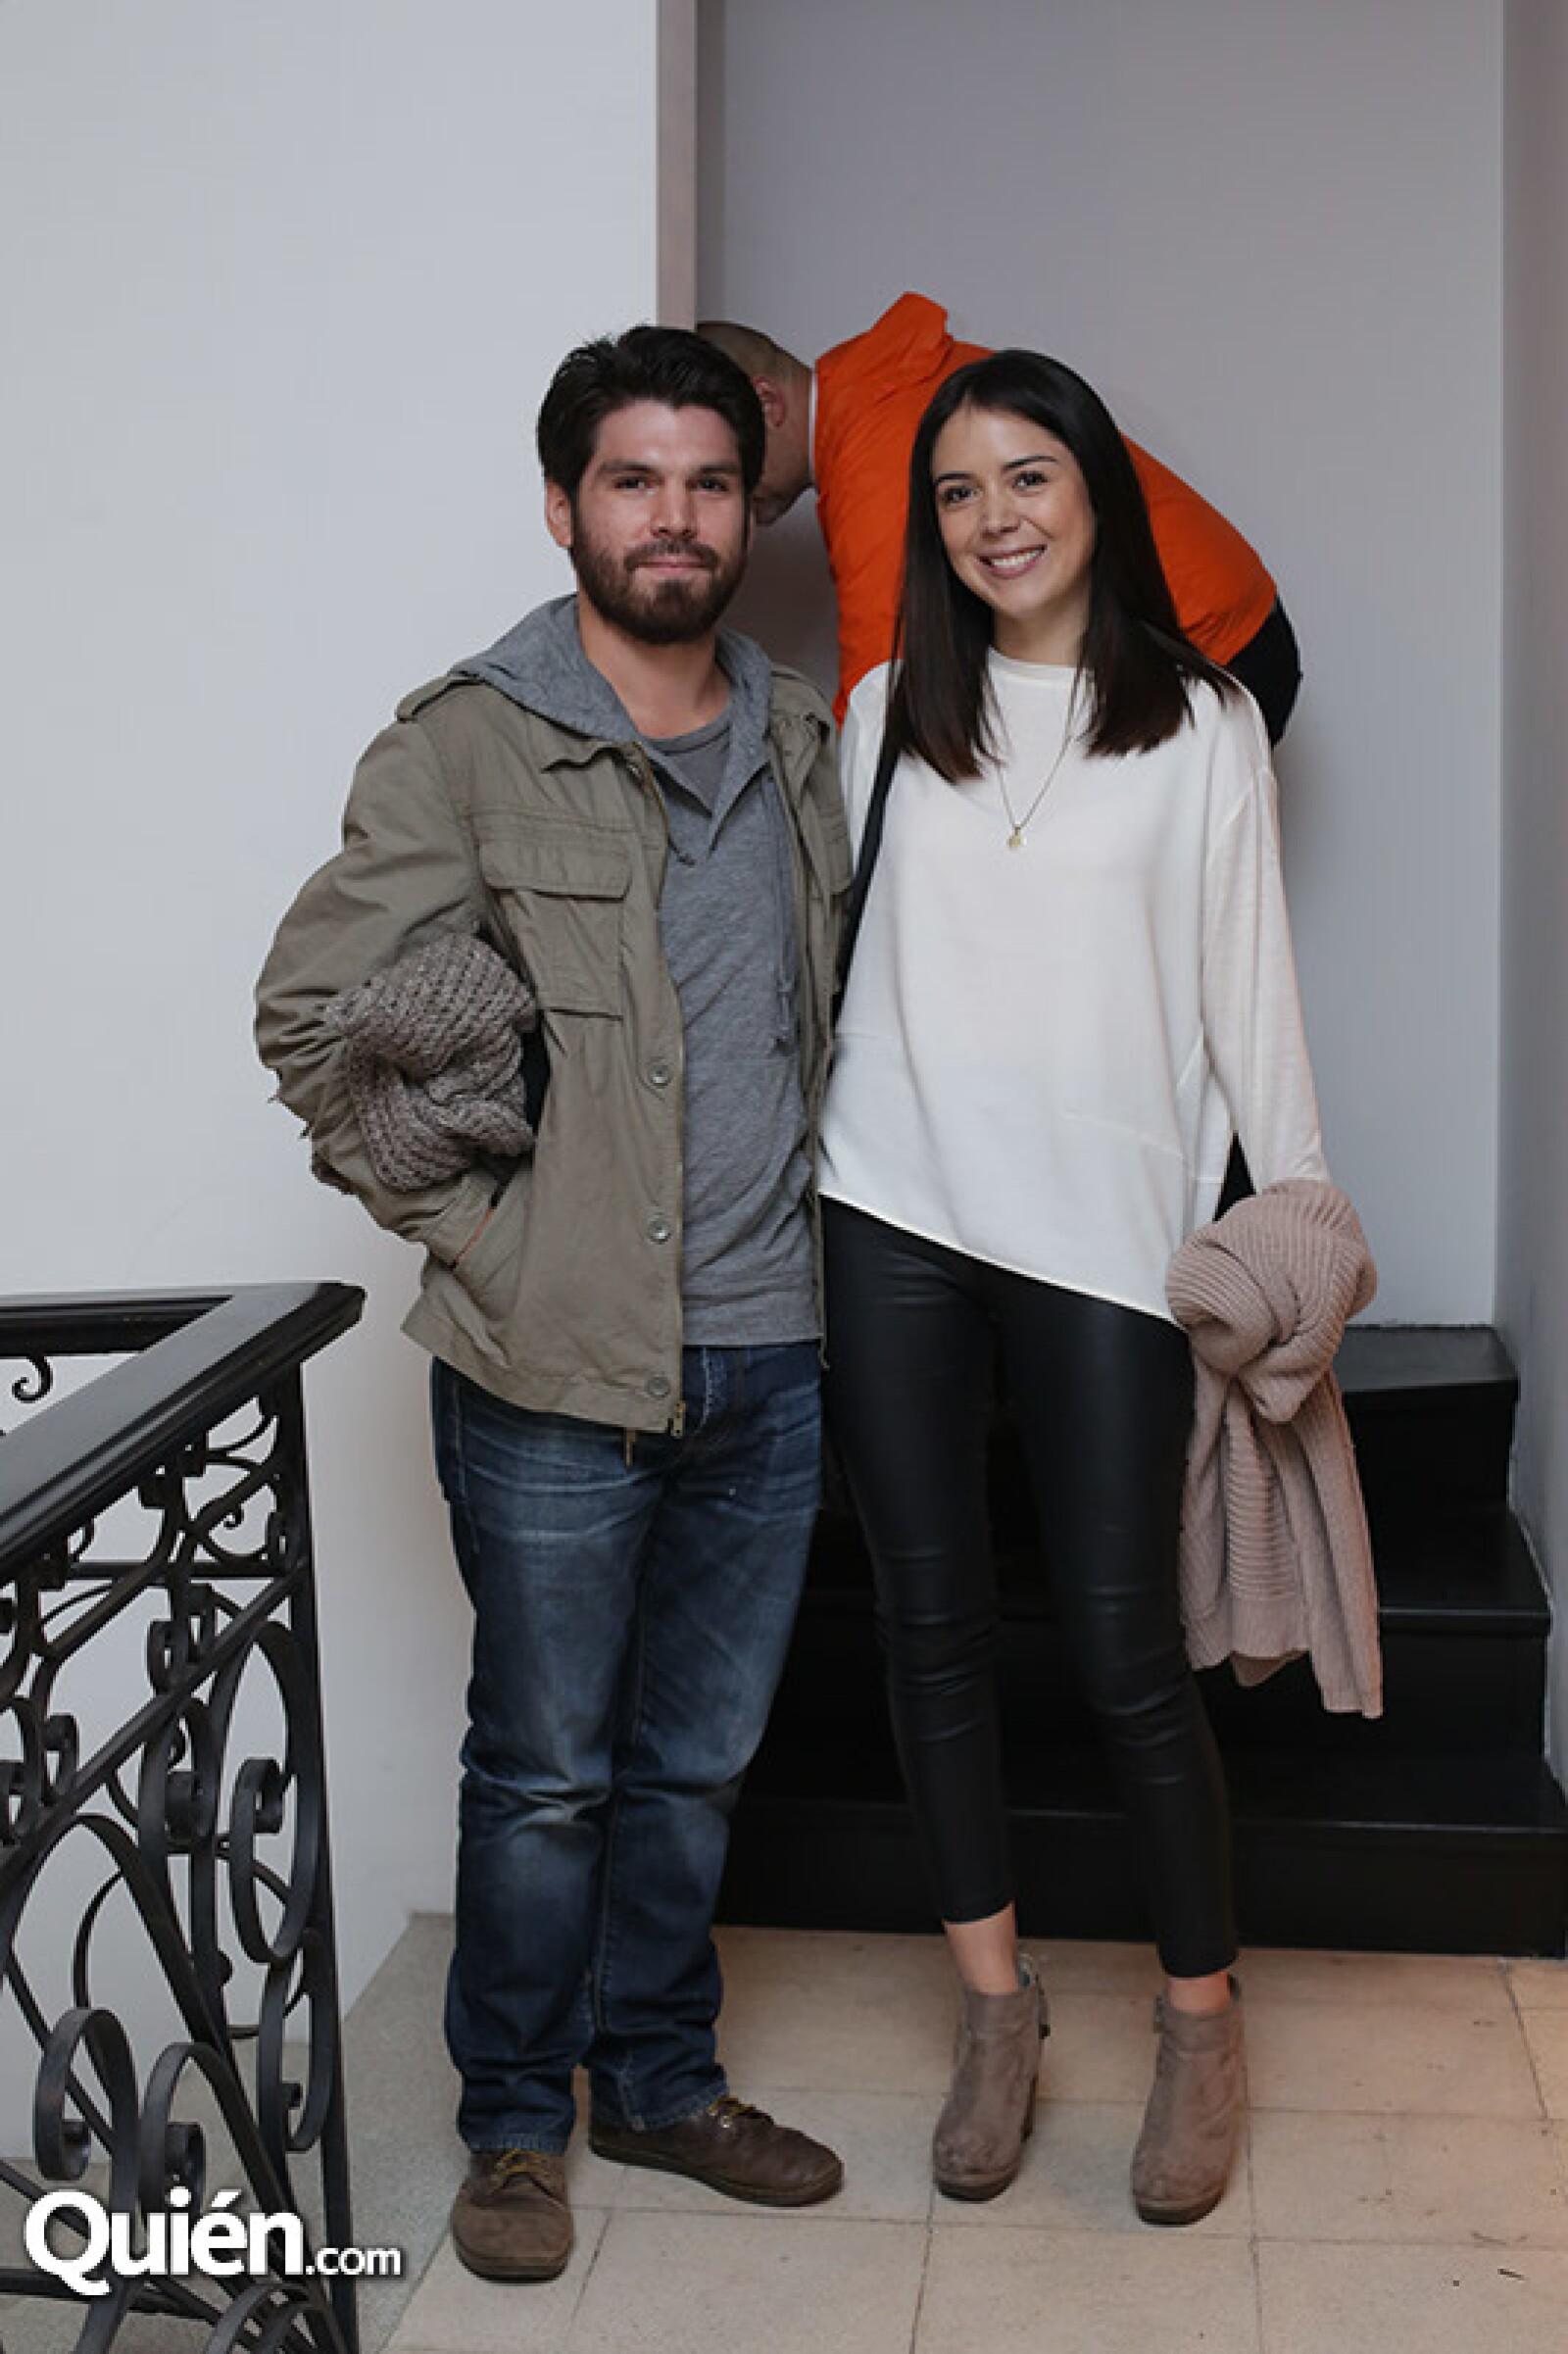 Felipe Luna y Mireille Frangos